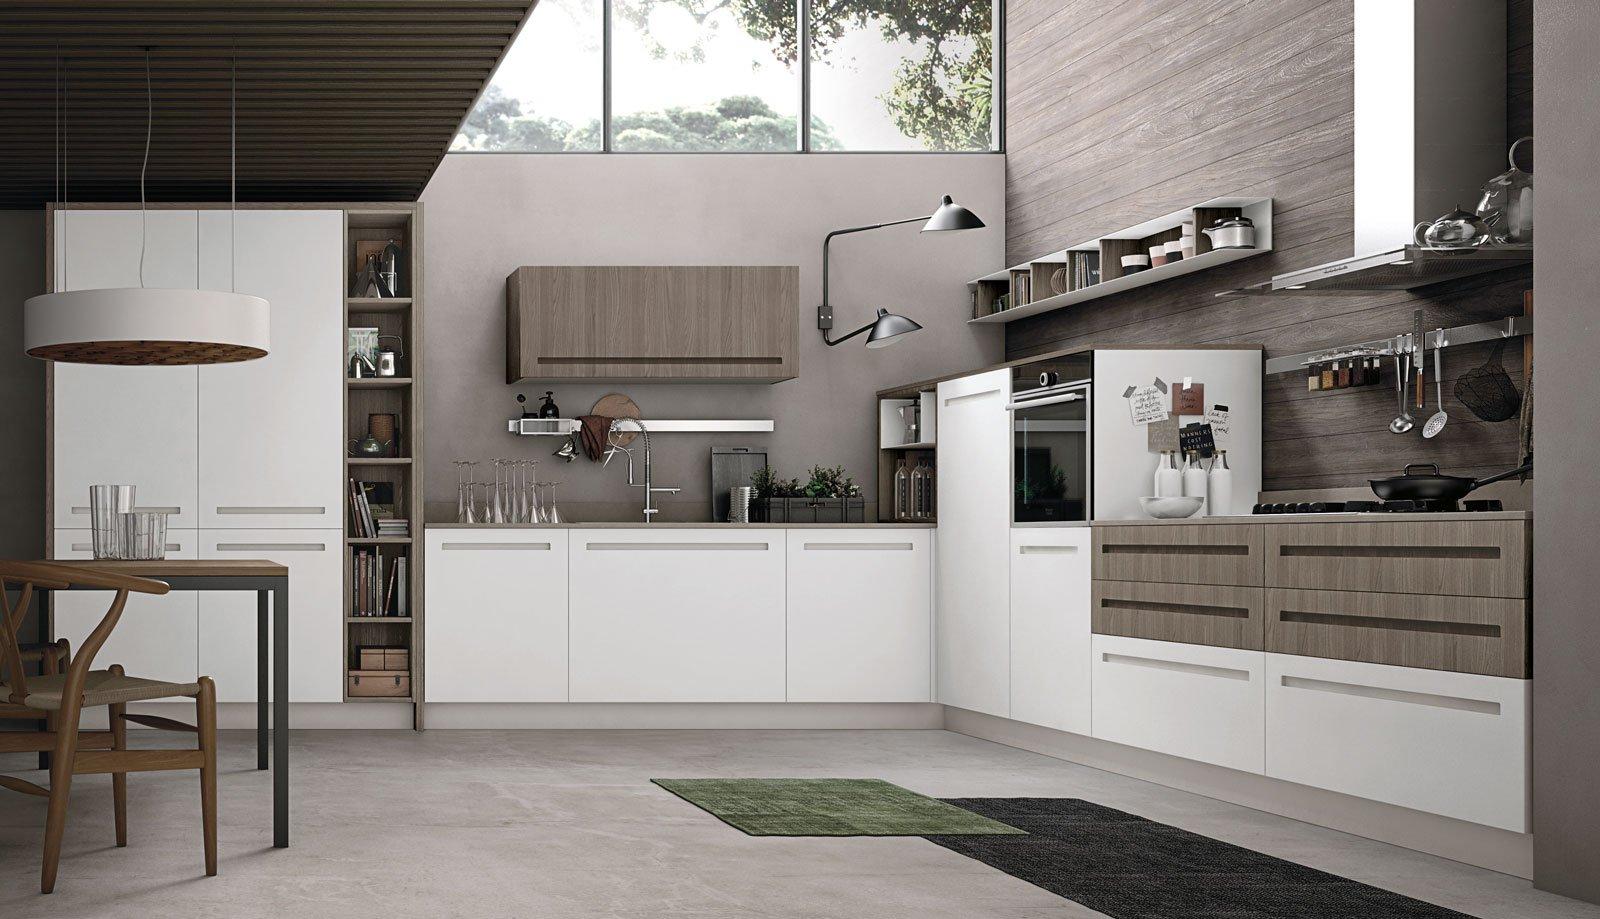 Latest cucina bianca il fascino eterno della luminosit - Cucina muratura bianca ...